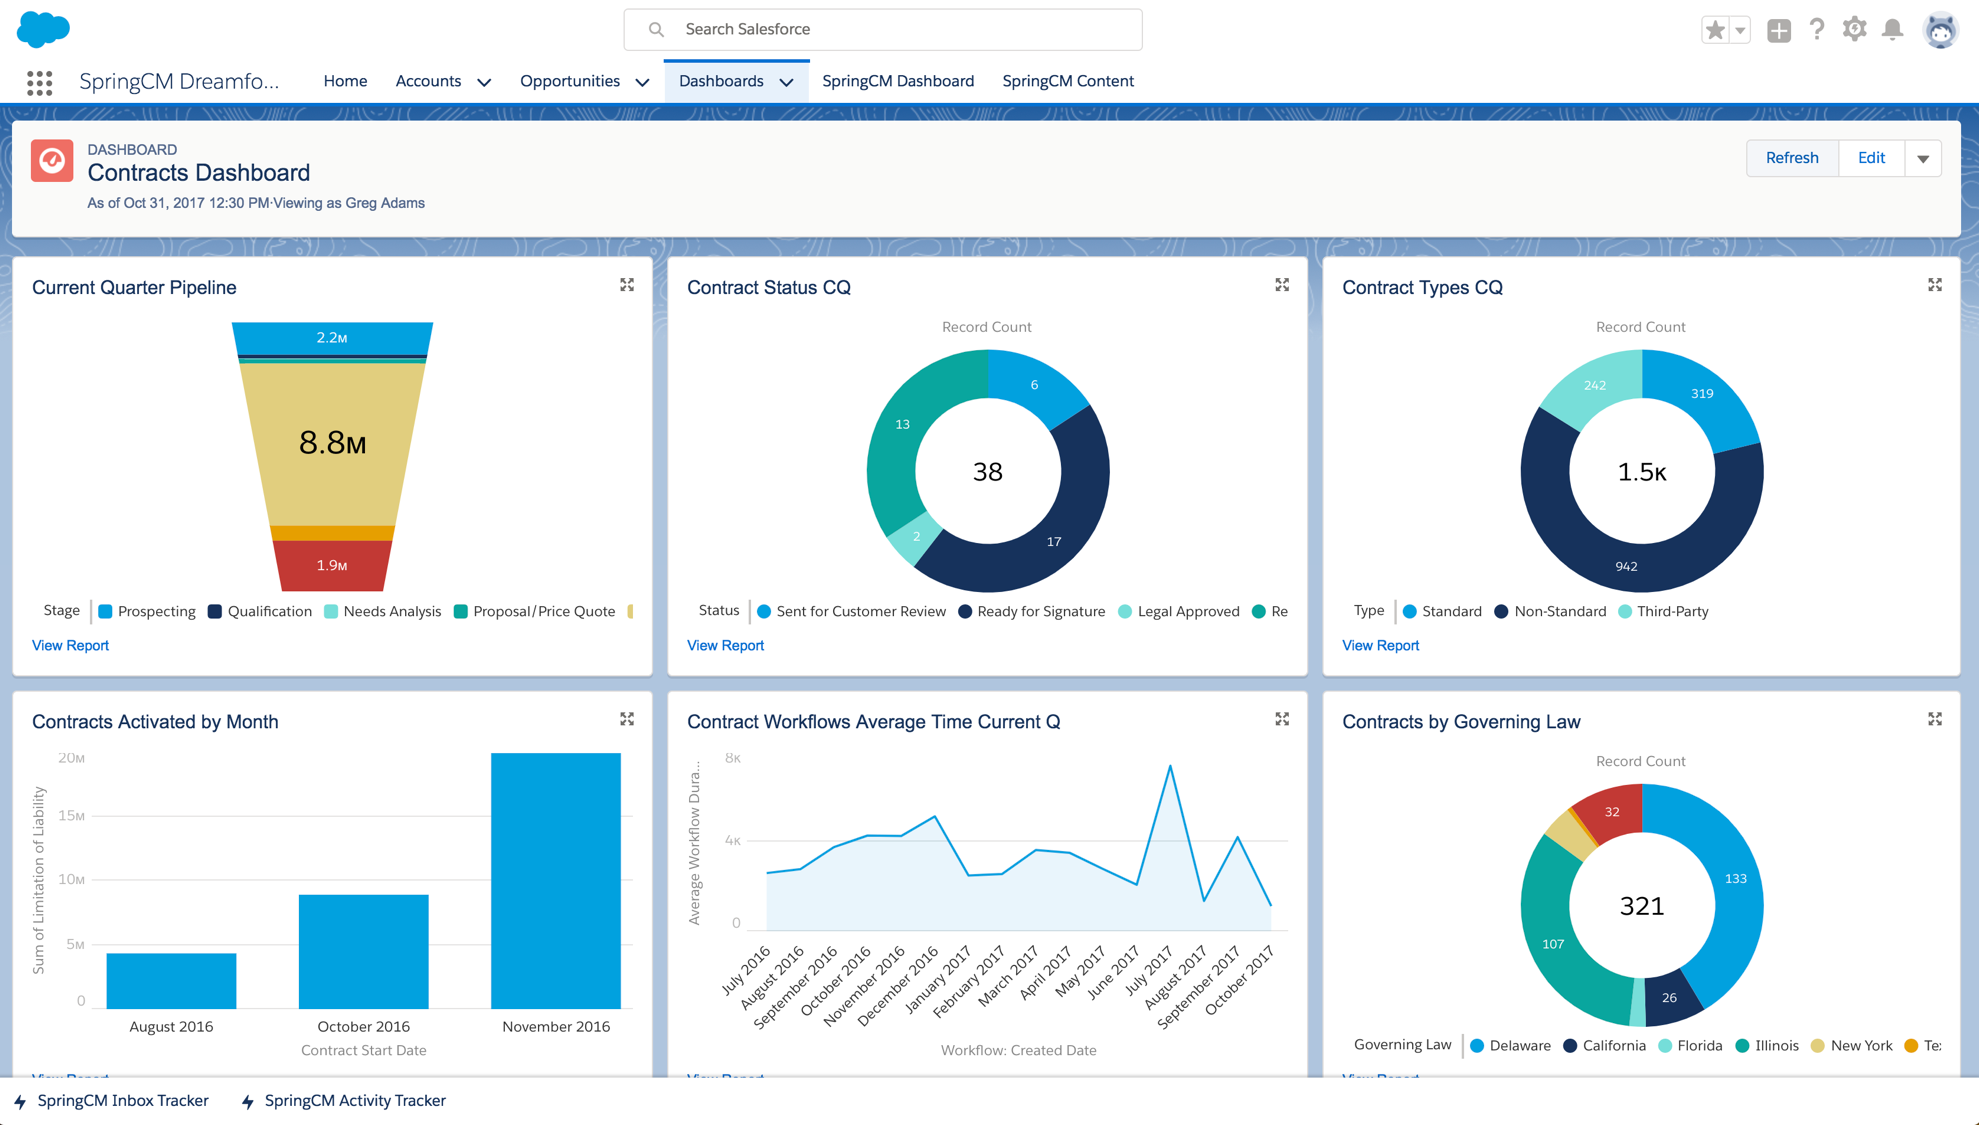 SpringCM Demo - Contract Dashboards in Salesforce